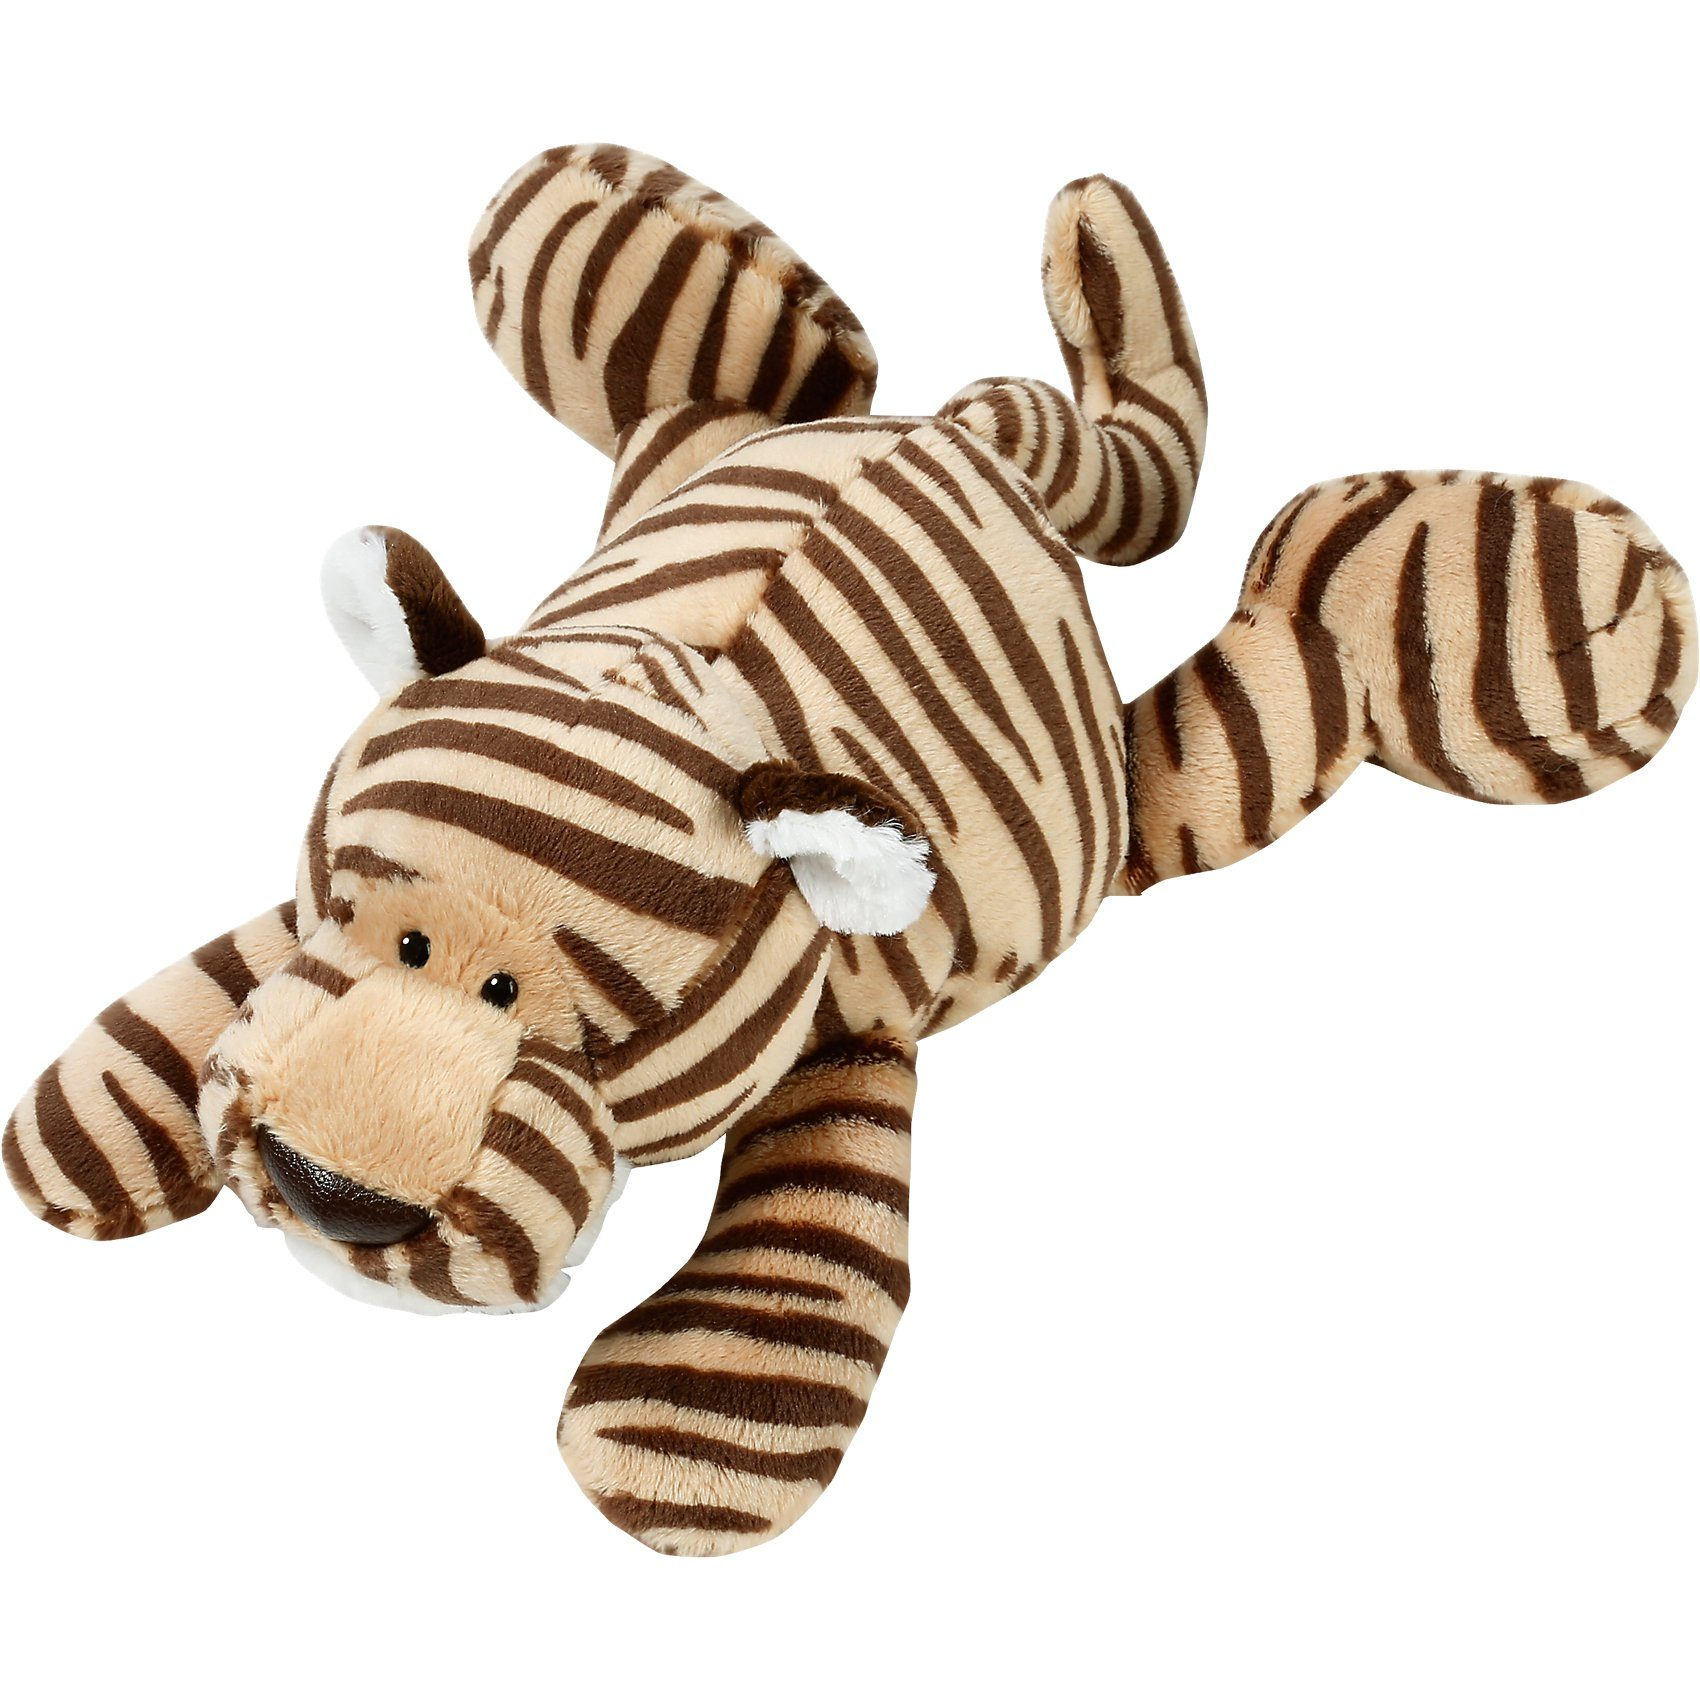 NICI Tiger Kofu 30cm liegend (40239)